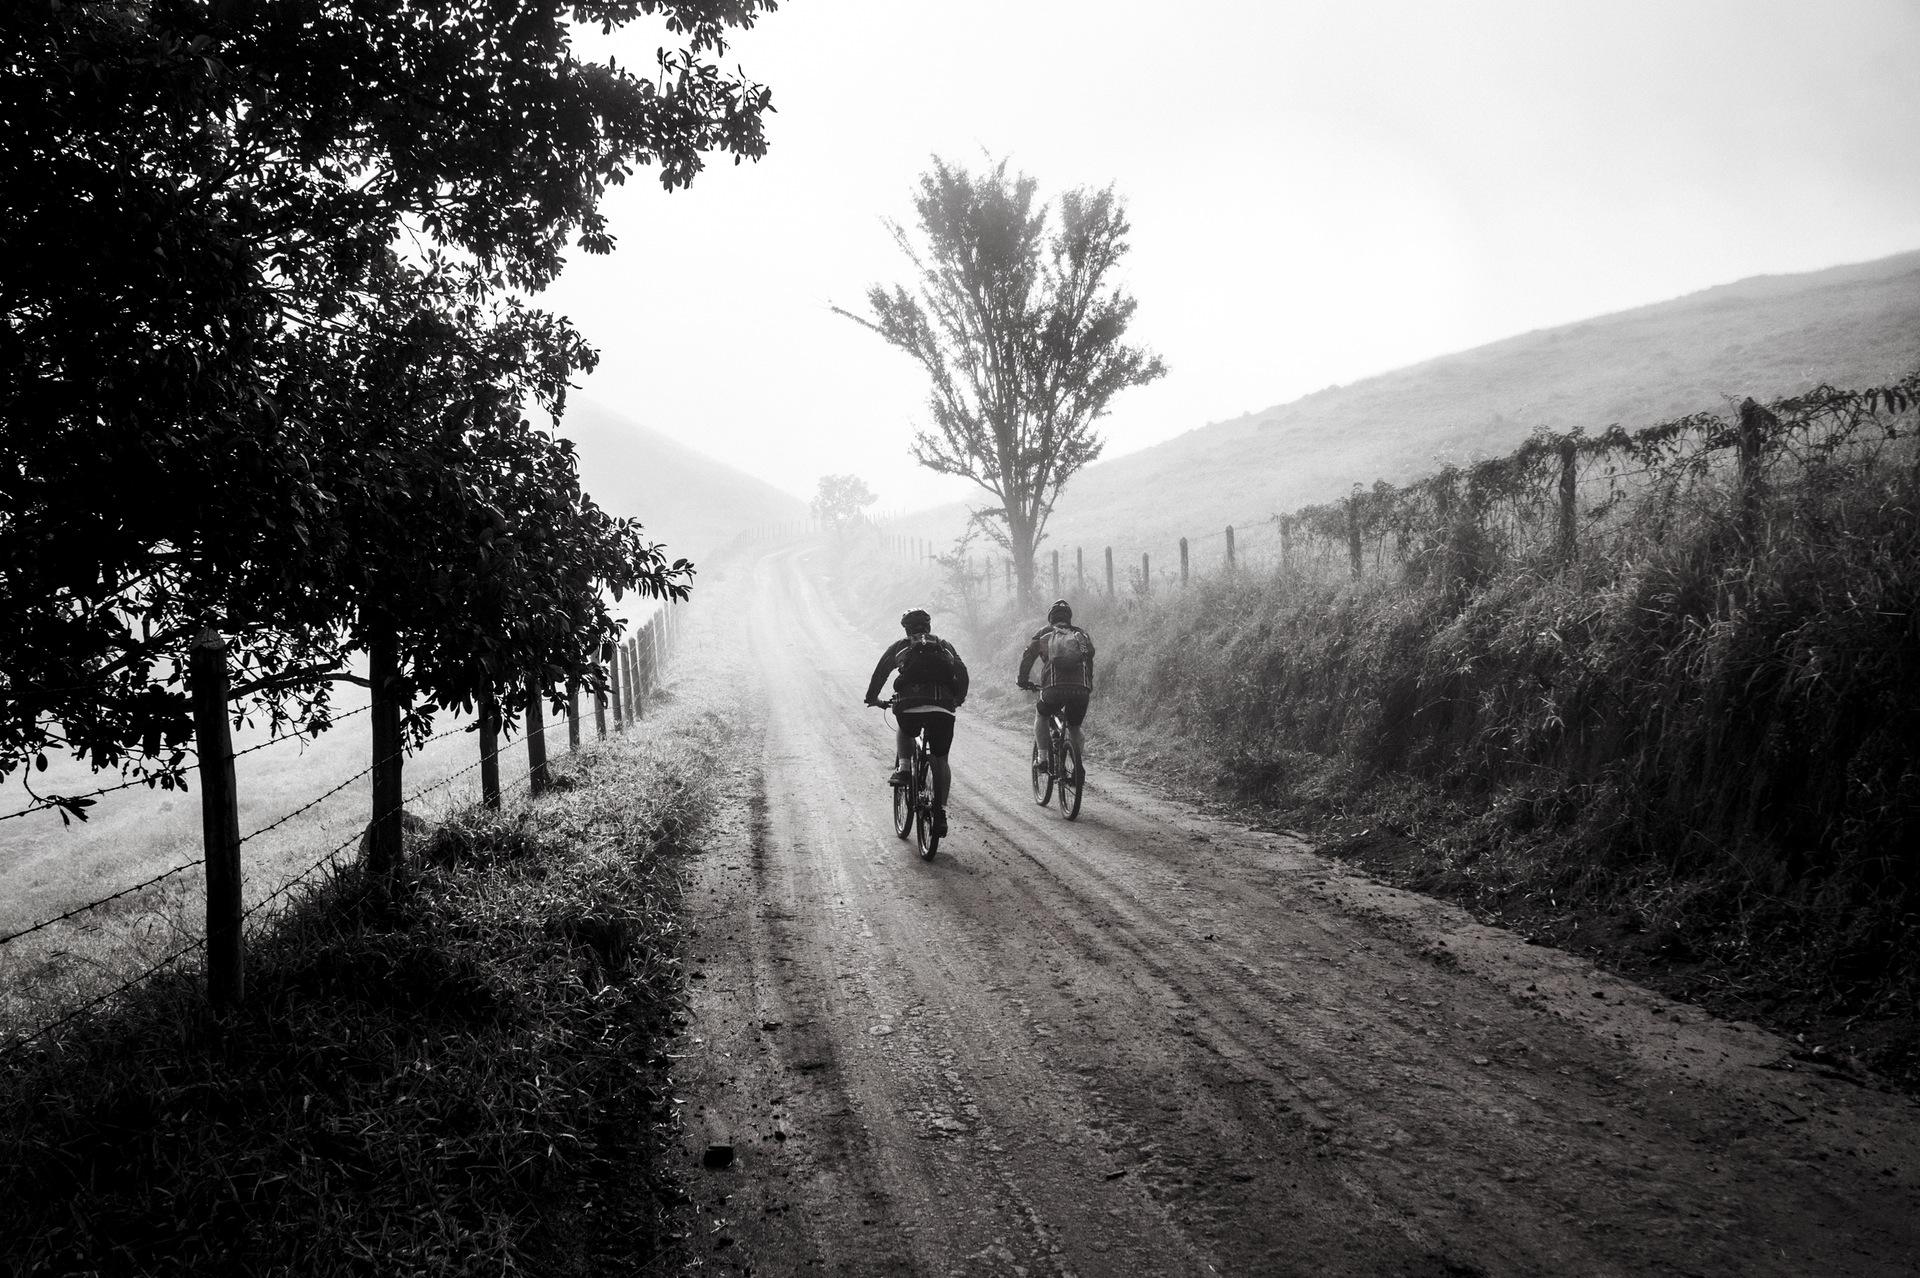 bike-trip-friends-cycling-163305[2].jpeg